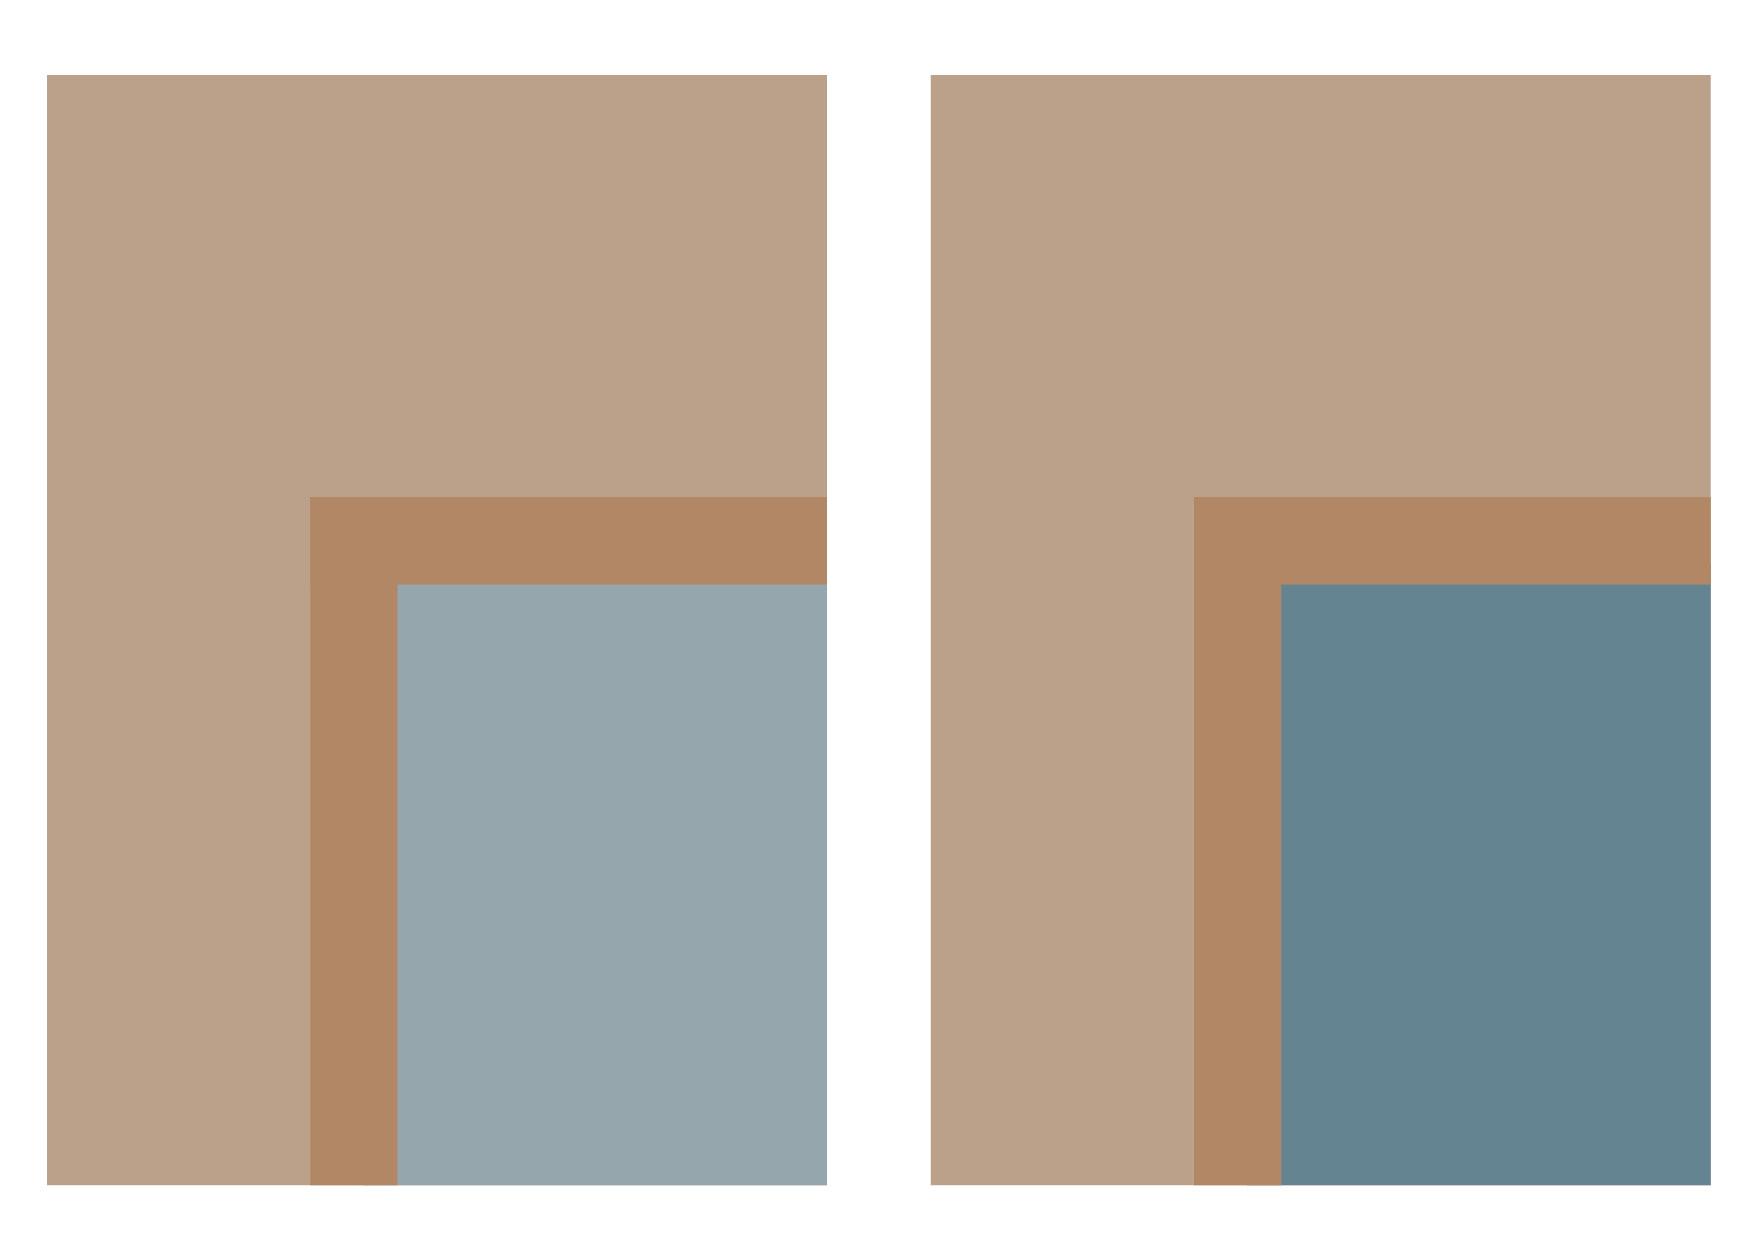 Blåbrun dörrförslag